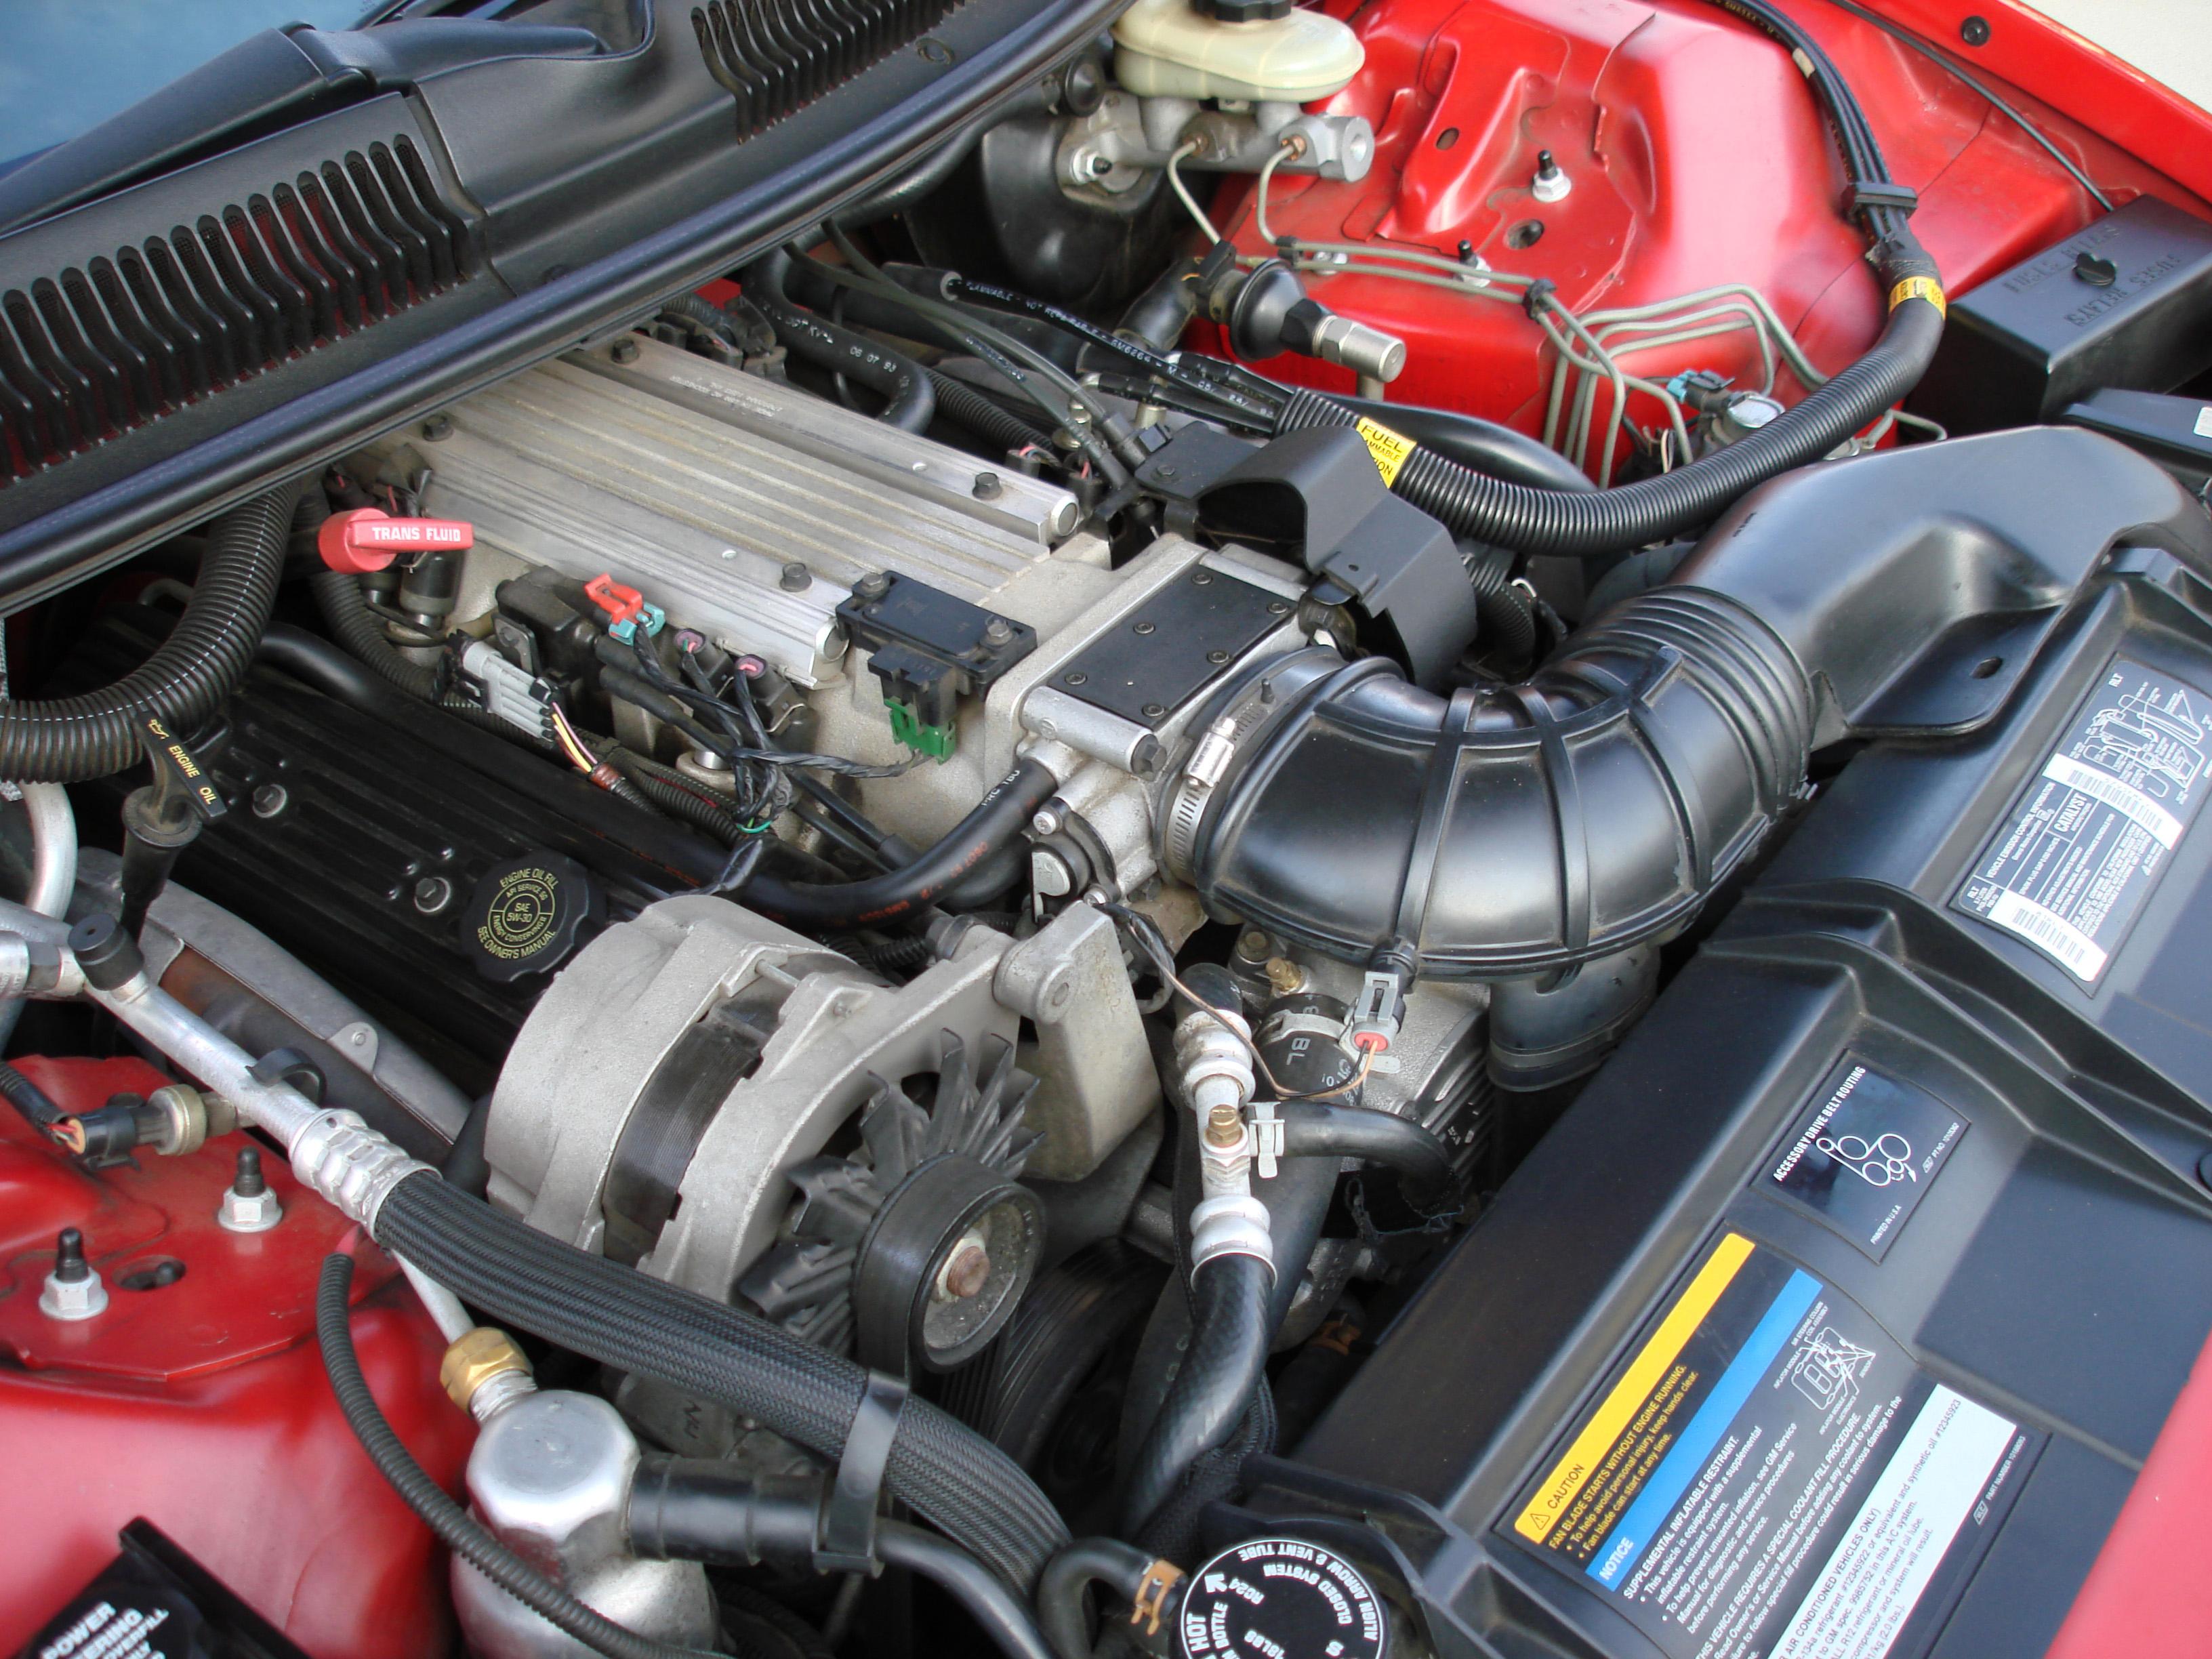 VA_3957] 96 Impala Ss Engine Diagram Download DiagramOrsal Elia Arch Dome Mohammedshrine Librar Wiring 101